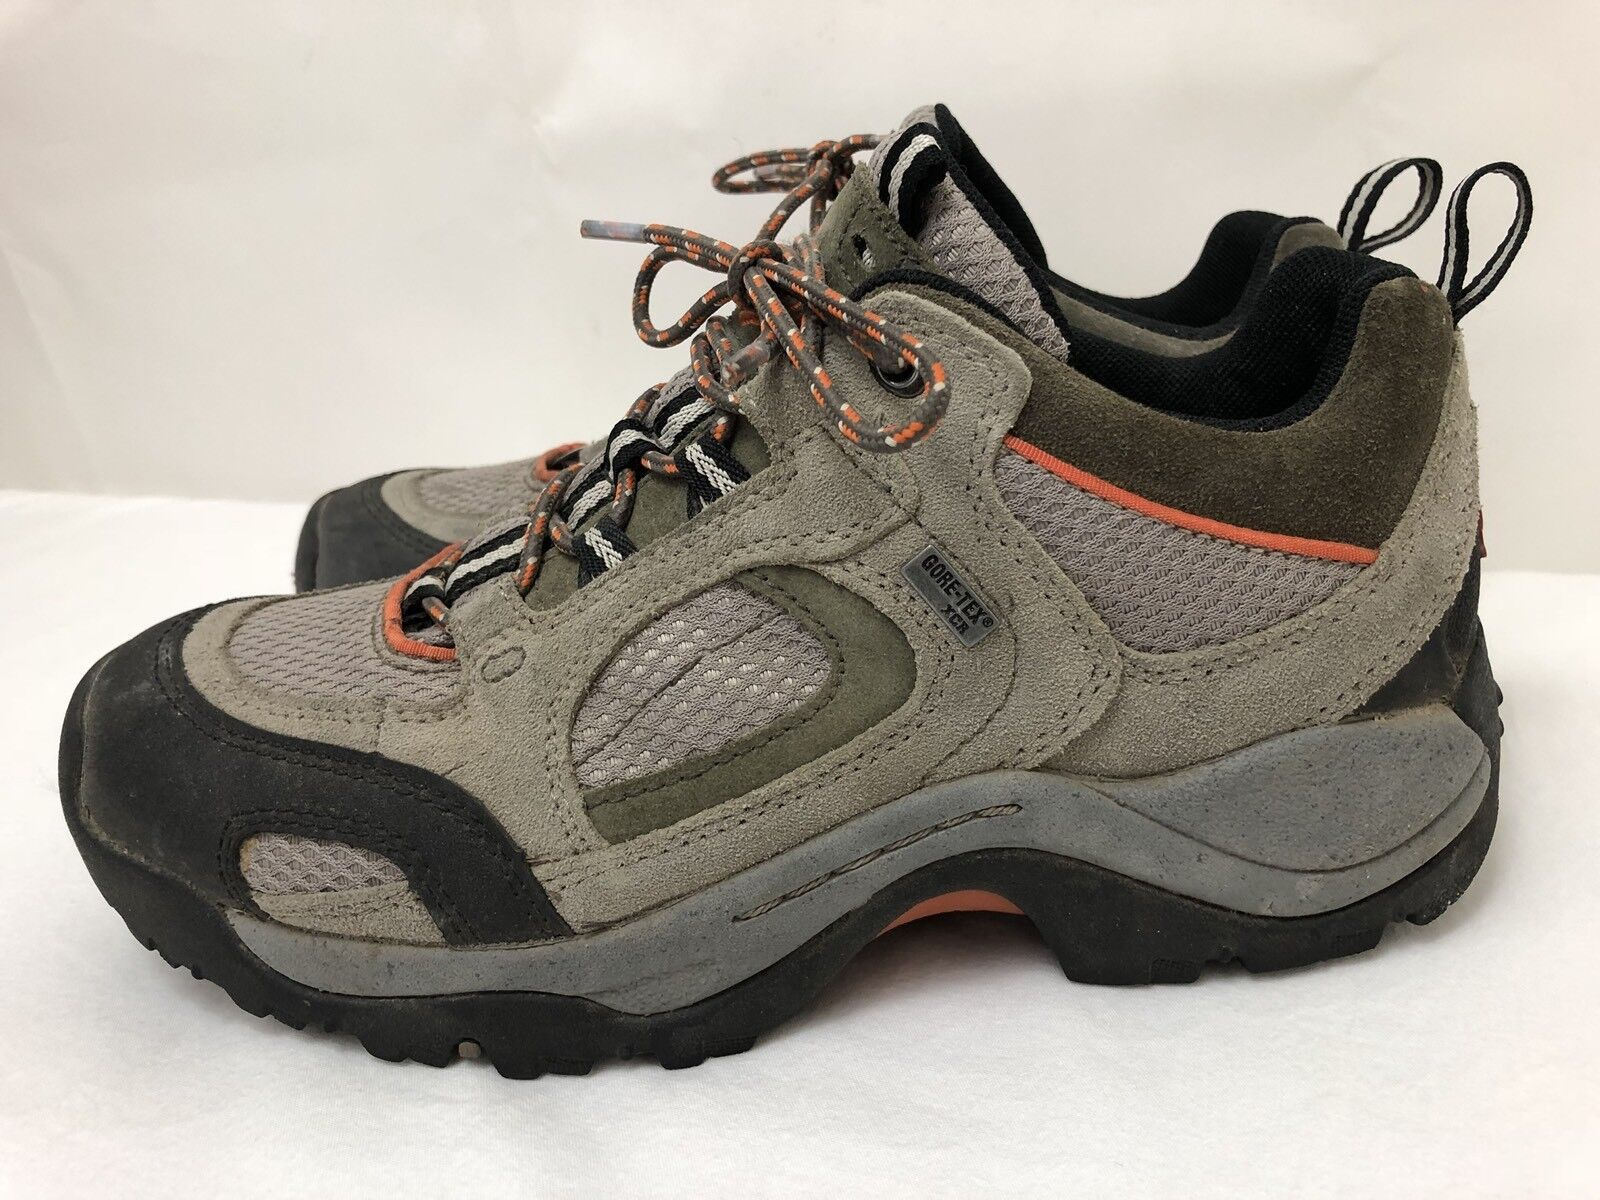 Womens DANNER Agitator Mushroom Gray-Taupe Gore-Tex 8.5 Trail Hiking Shoes SIZE 8.5 Gore-Tex e727d4